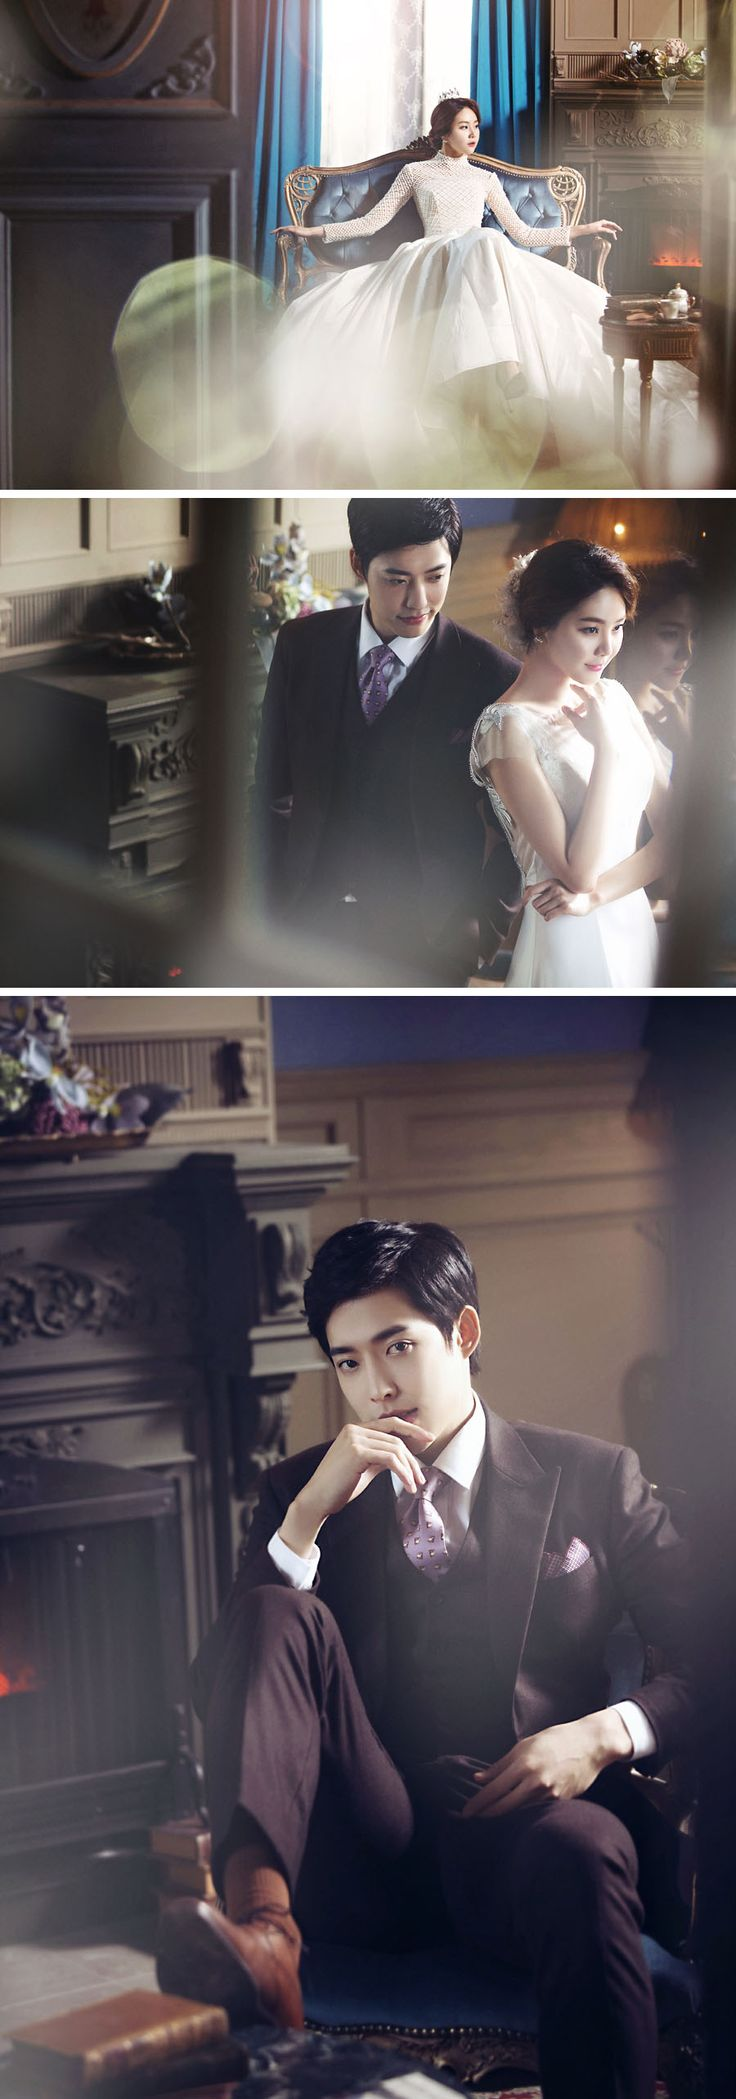 Vintage & luxrious // Korean wedding photography // Bong Studio